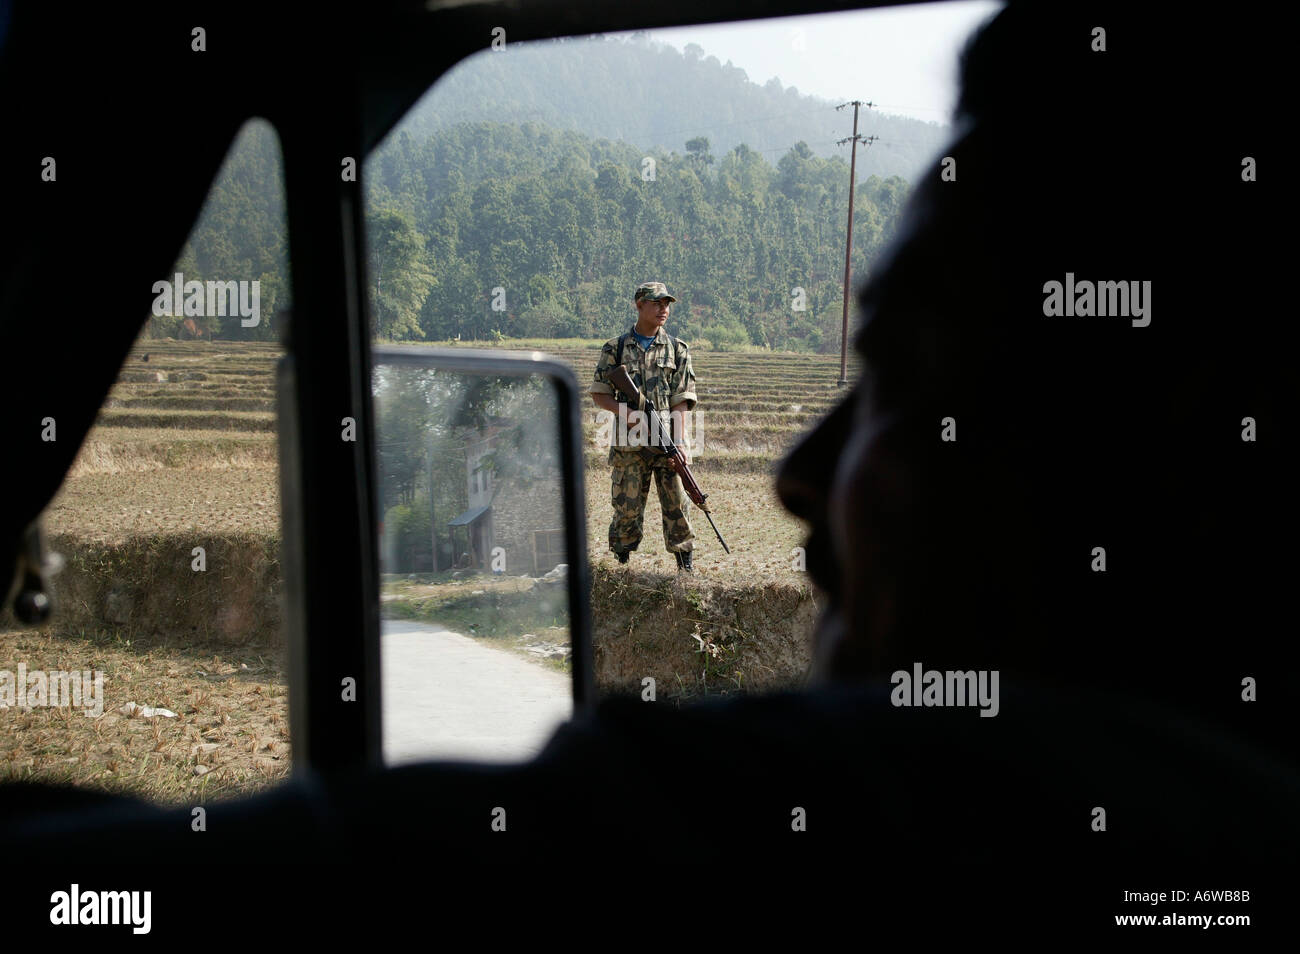 Asia Nepal November 2003 Government soldiers create roadblocks - Stock Image